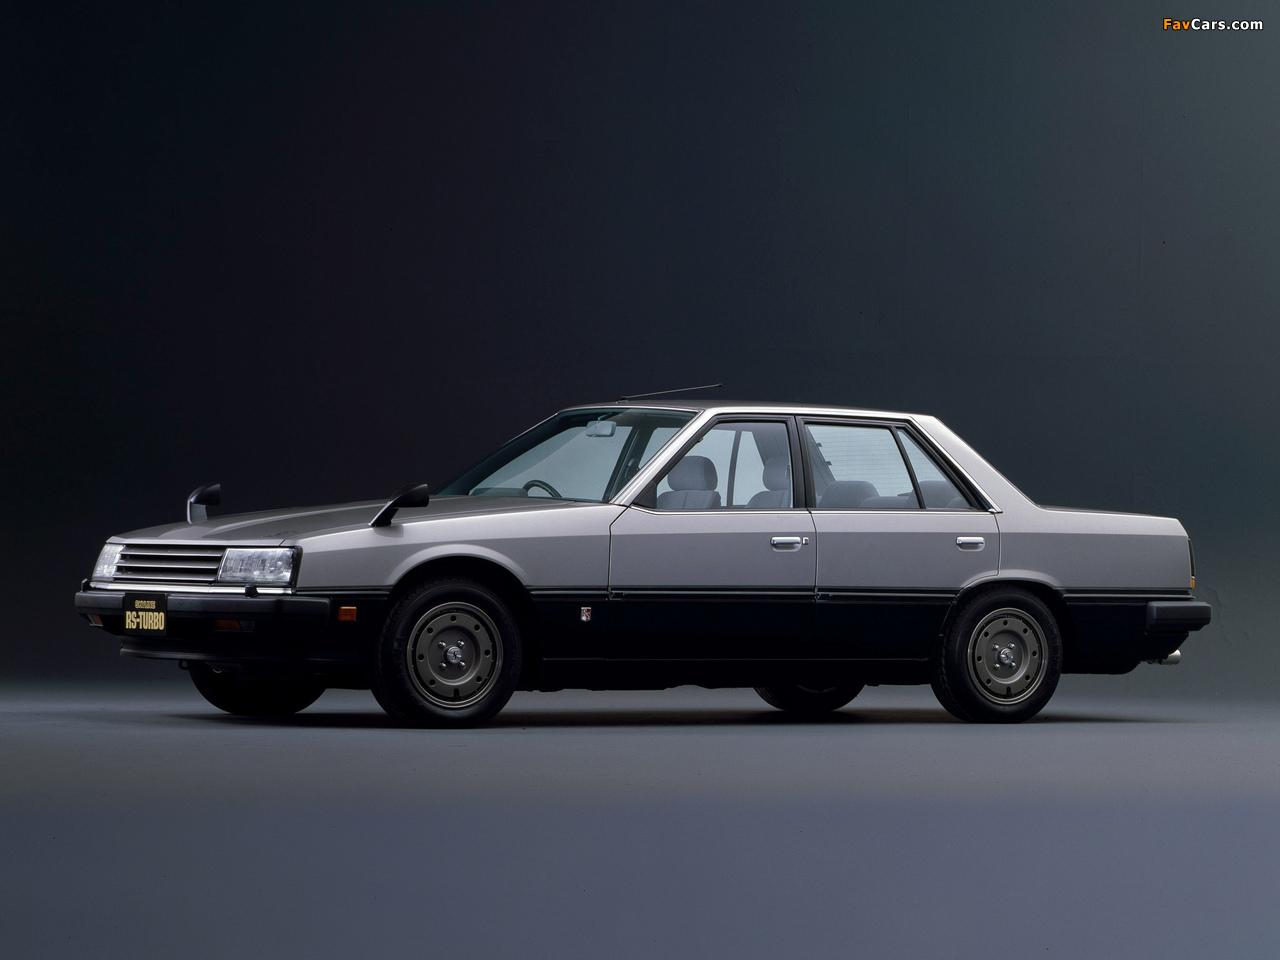 Nissan Skyline 2000 Turbo RS Sedan (DR30JFT) 1983 images (1280 x 960)